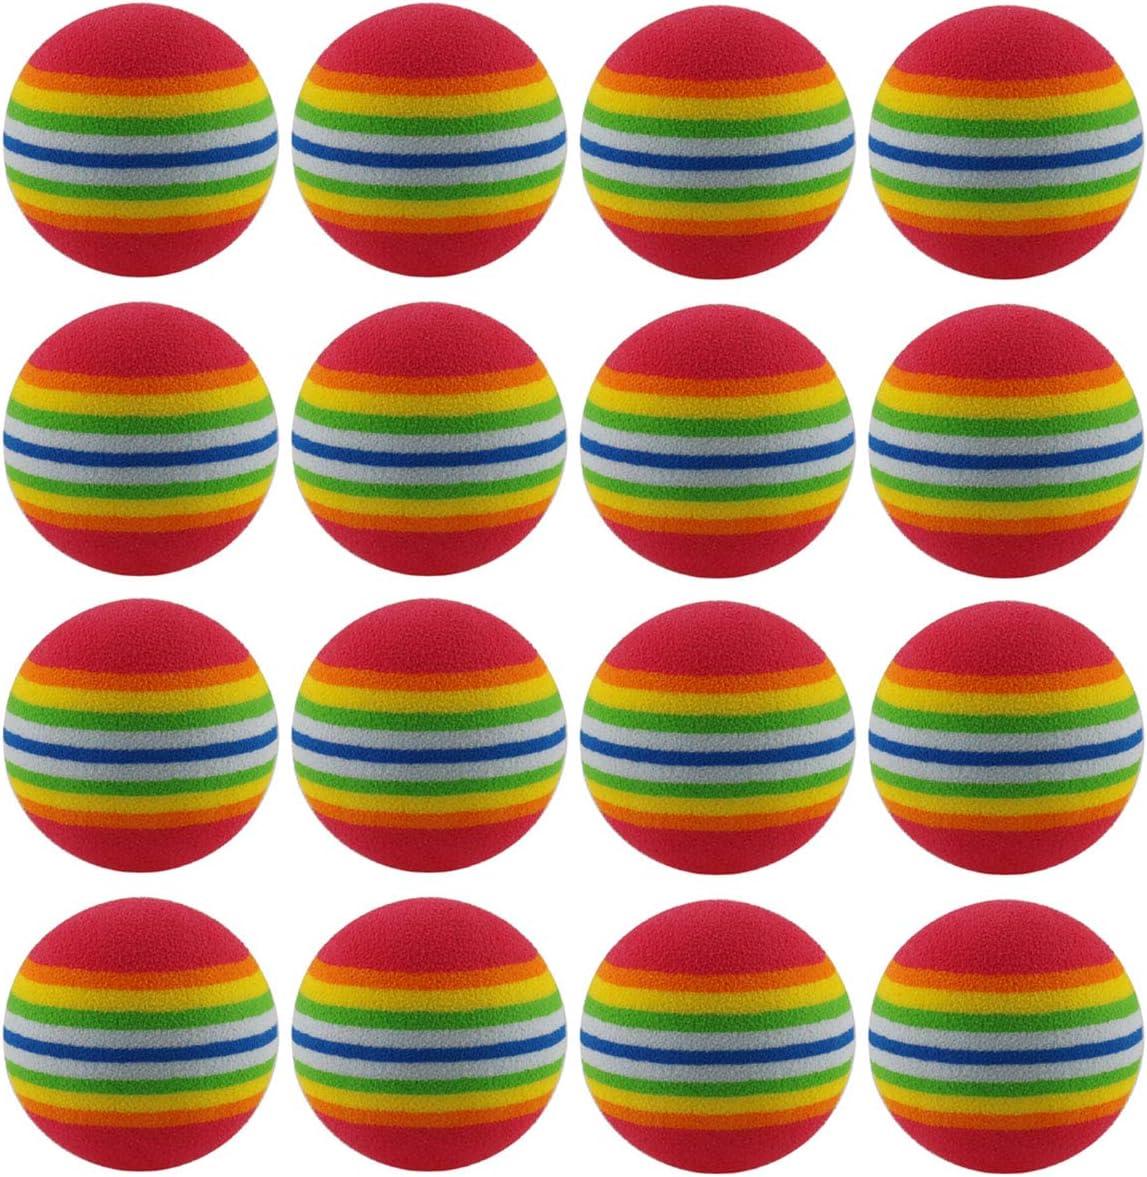 DGZZI Sponge Golf Ball 16PCS 42mm EVA Foam Rainbow Practice Golf Balls Training Soft Balls